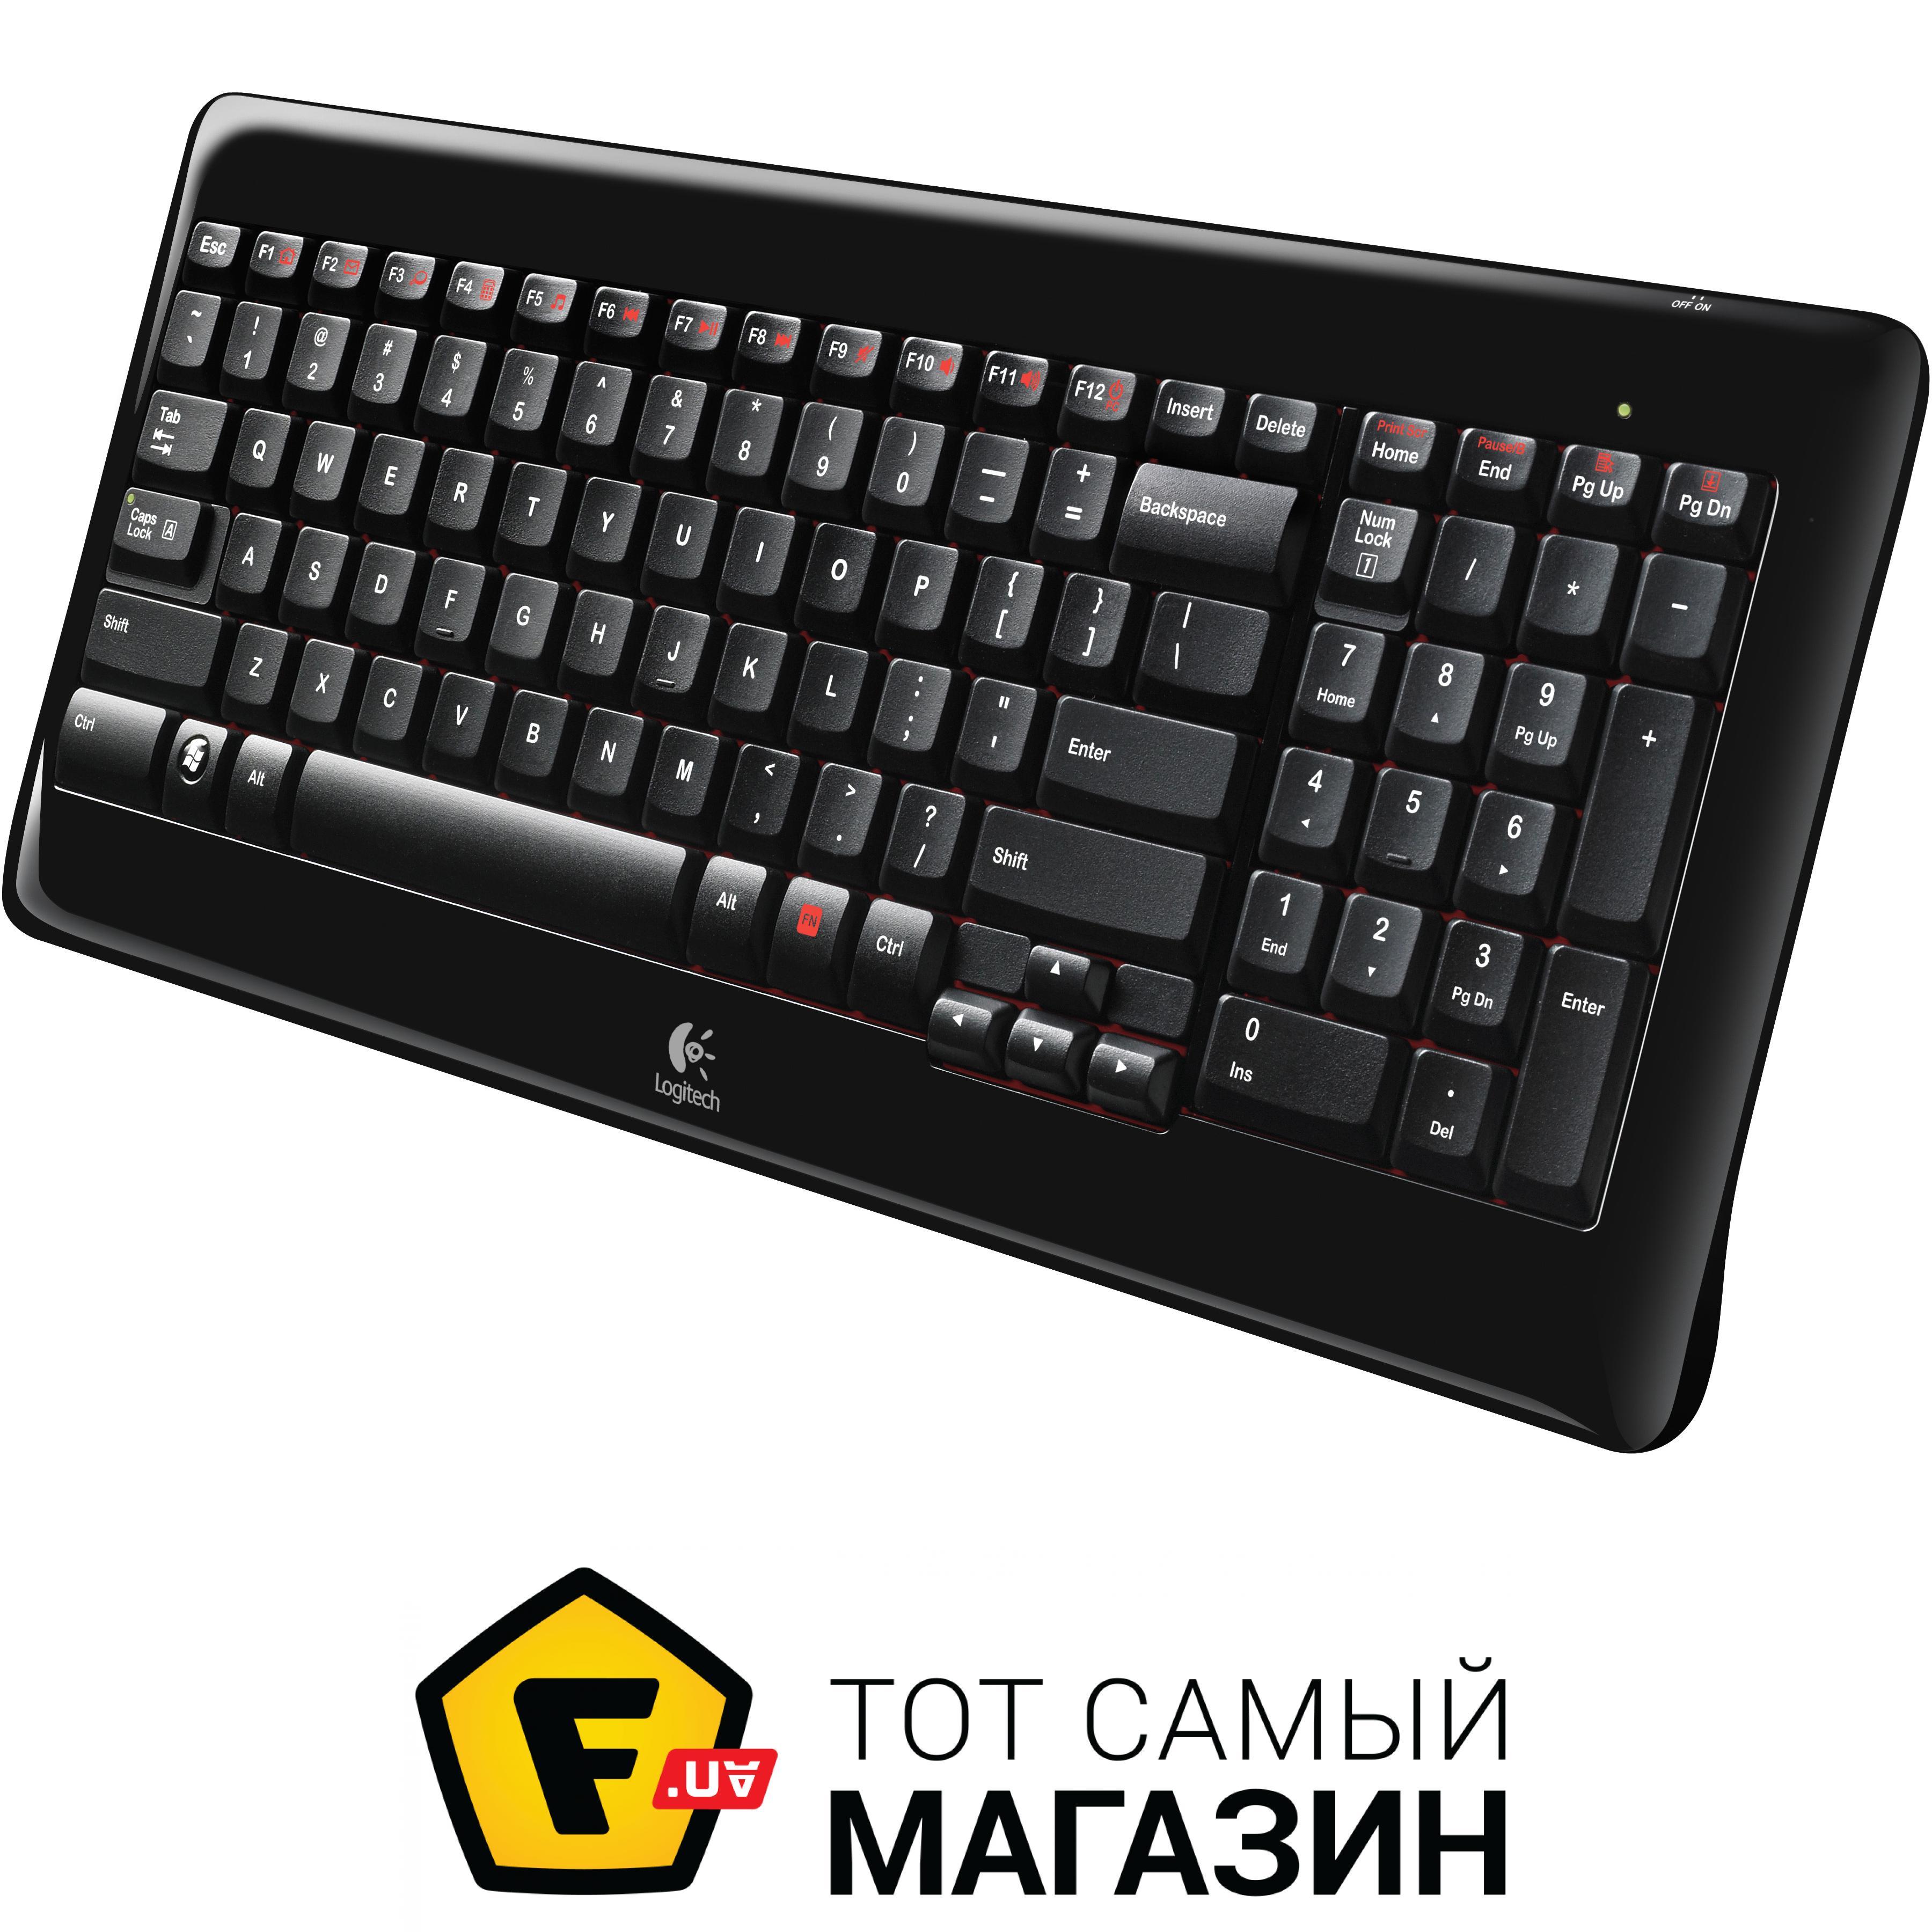 Logitech K340 Keyboard SetPoint Drivers for Windows Download